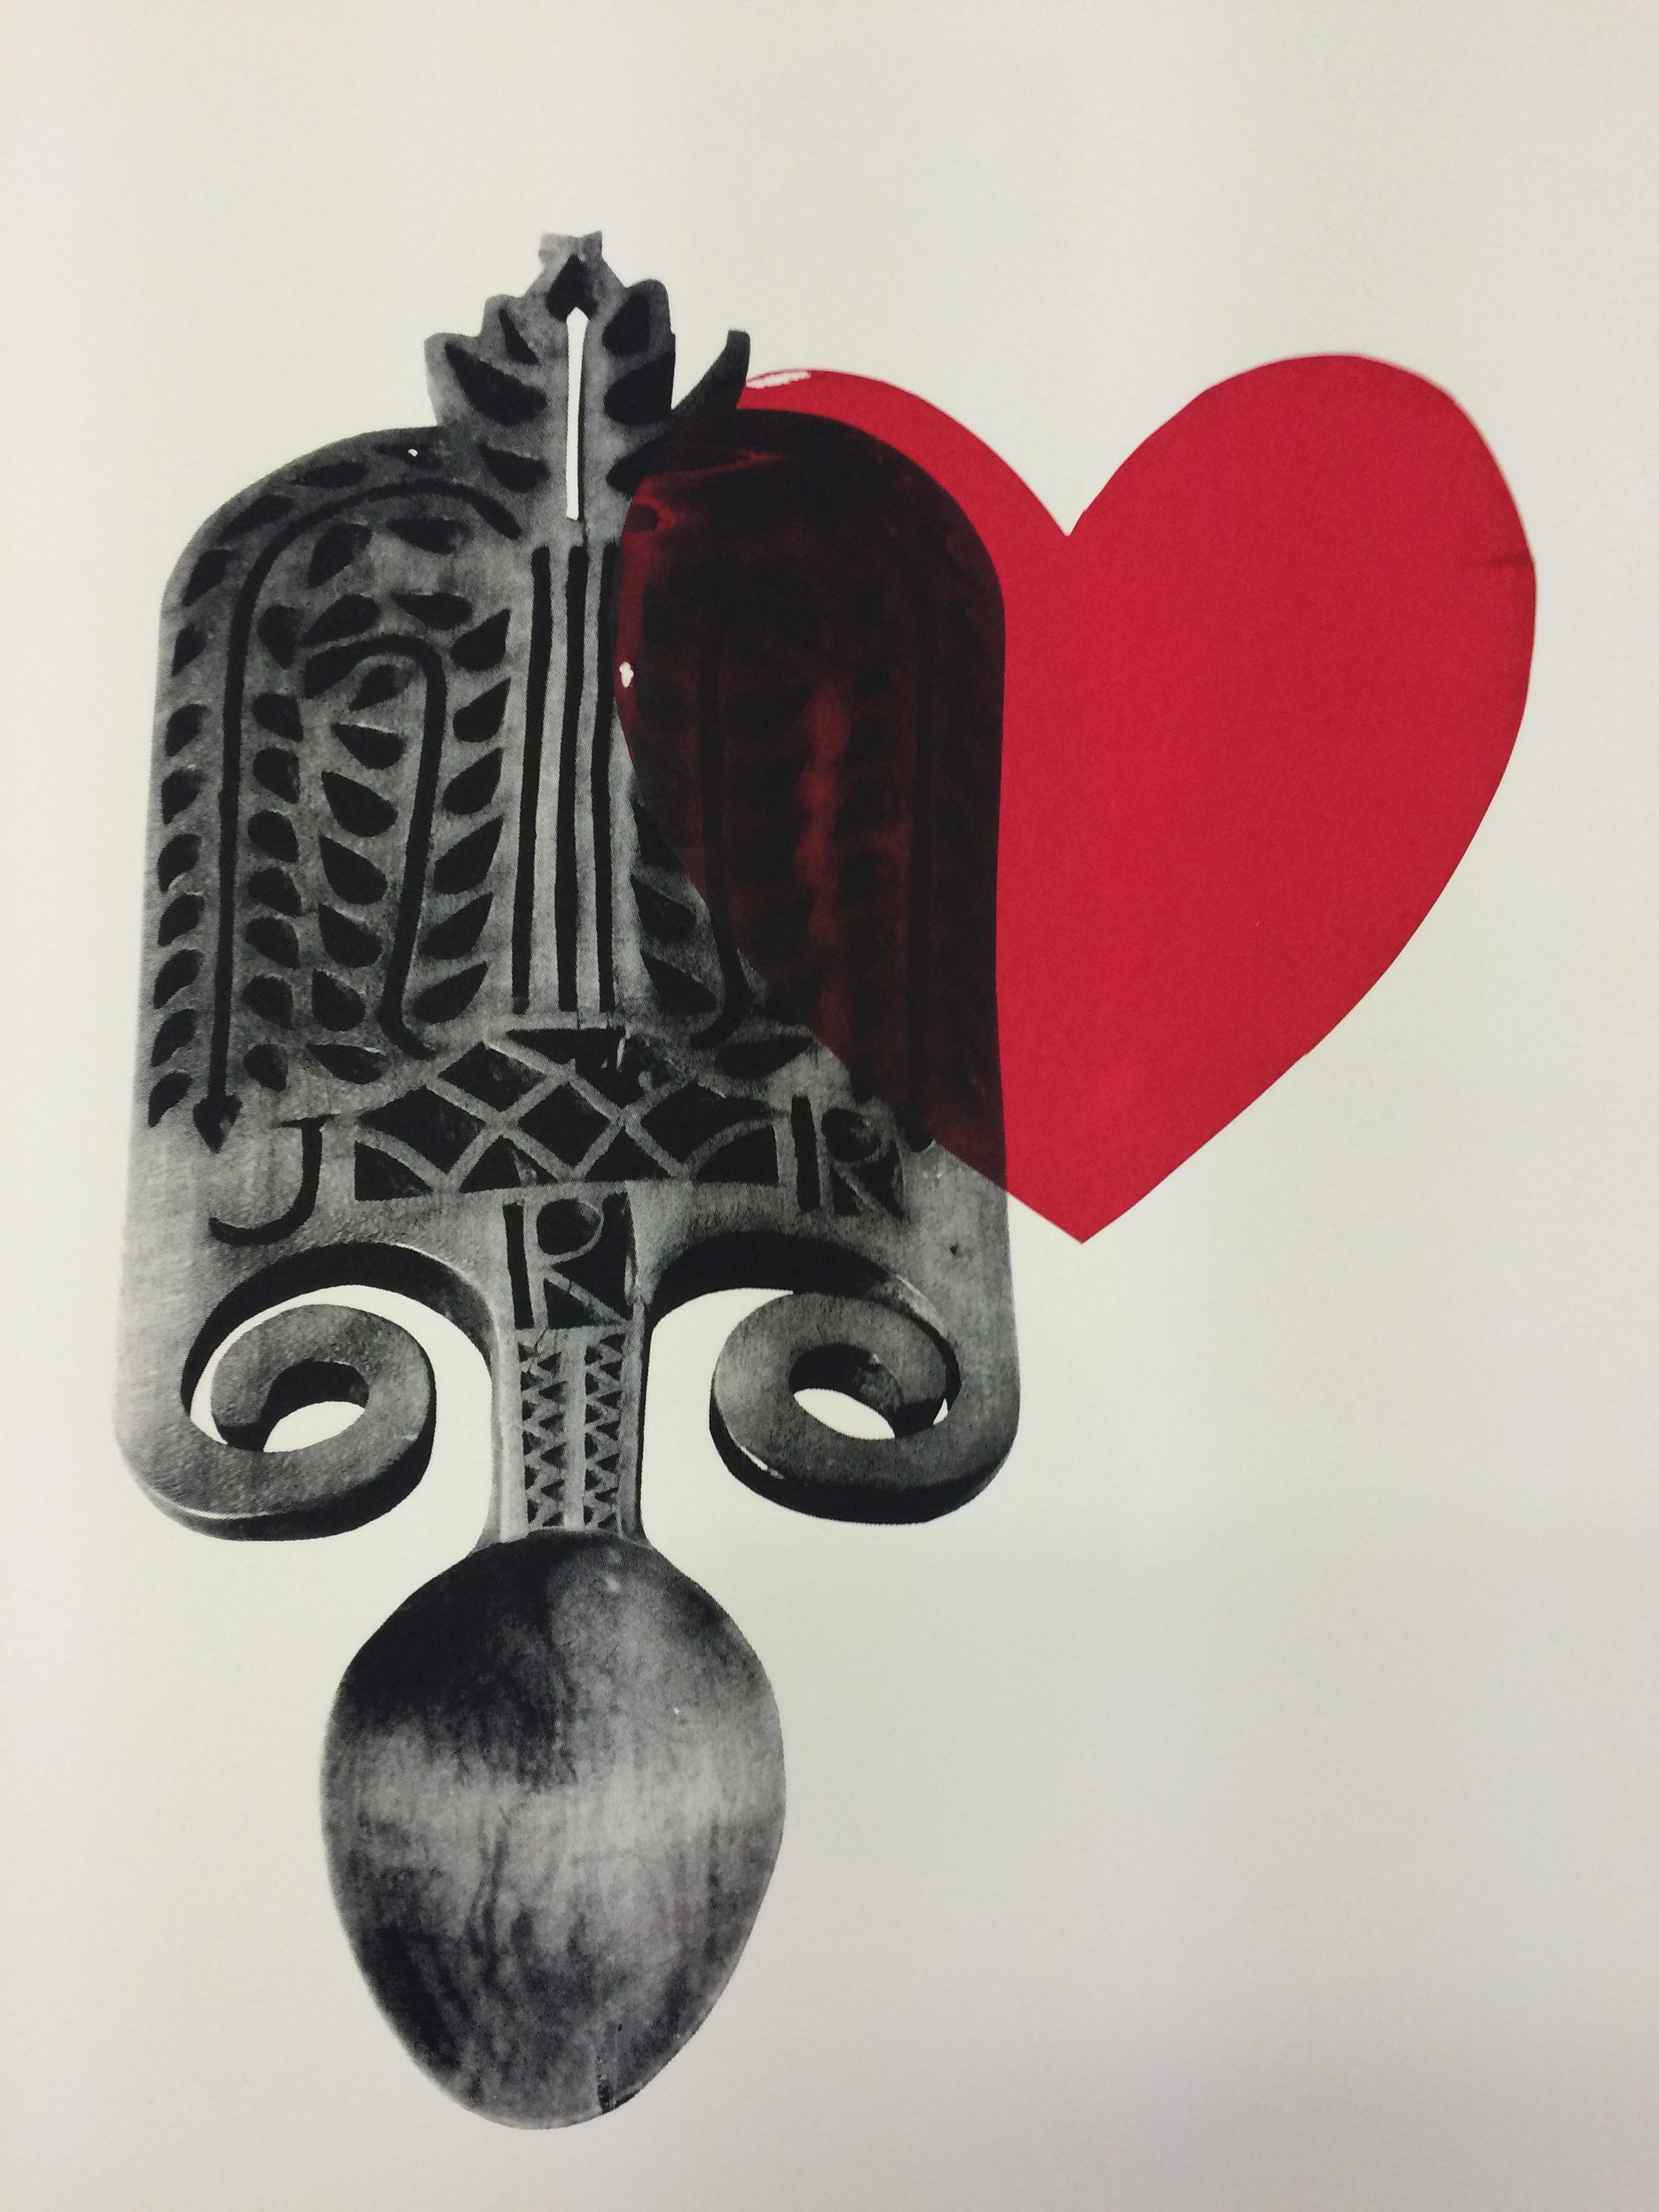 A0 Screenprint of love spoon, traditional Welsh love token